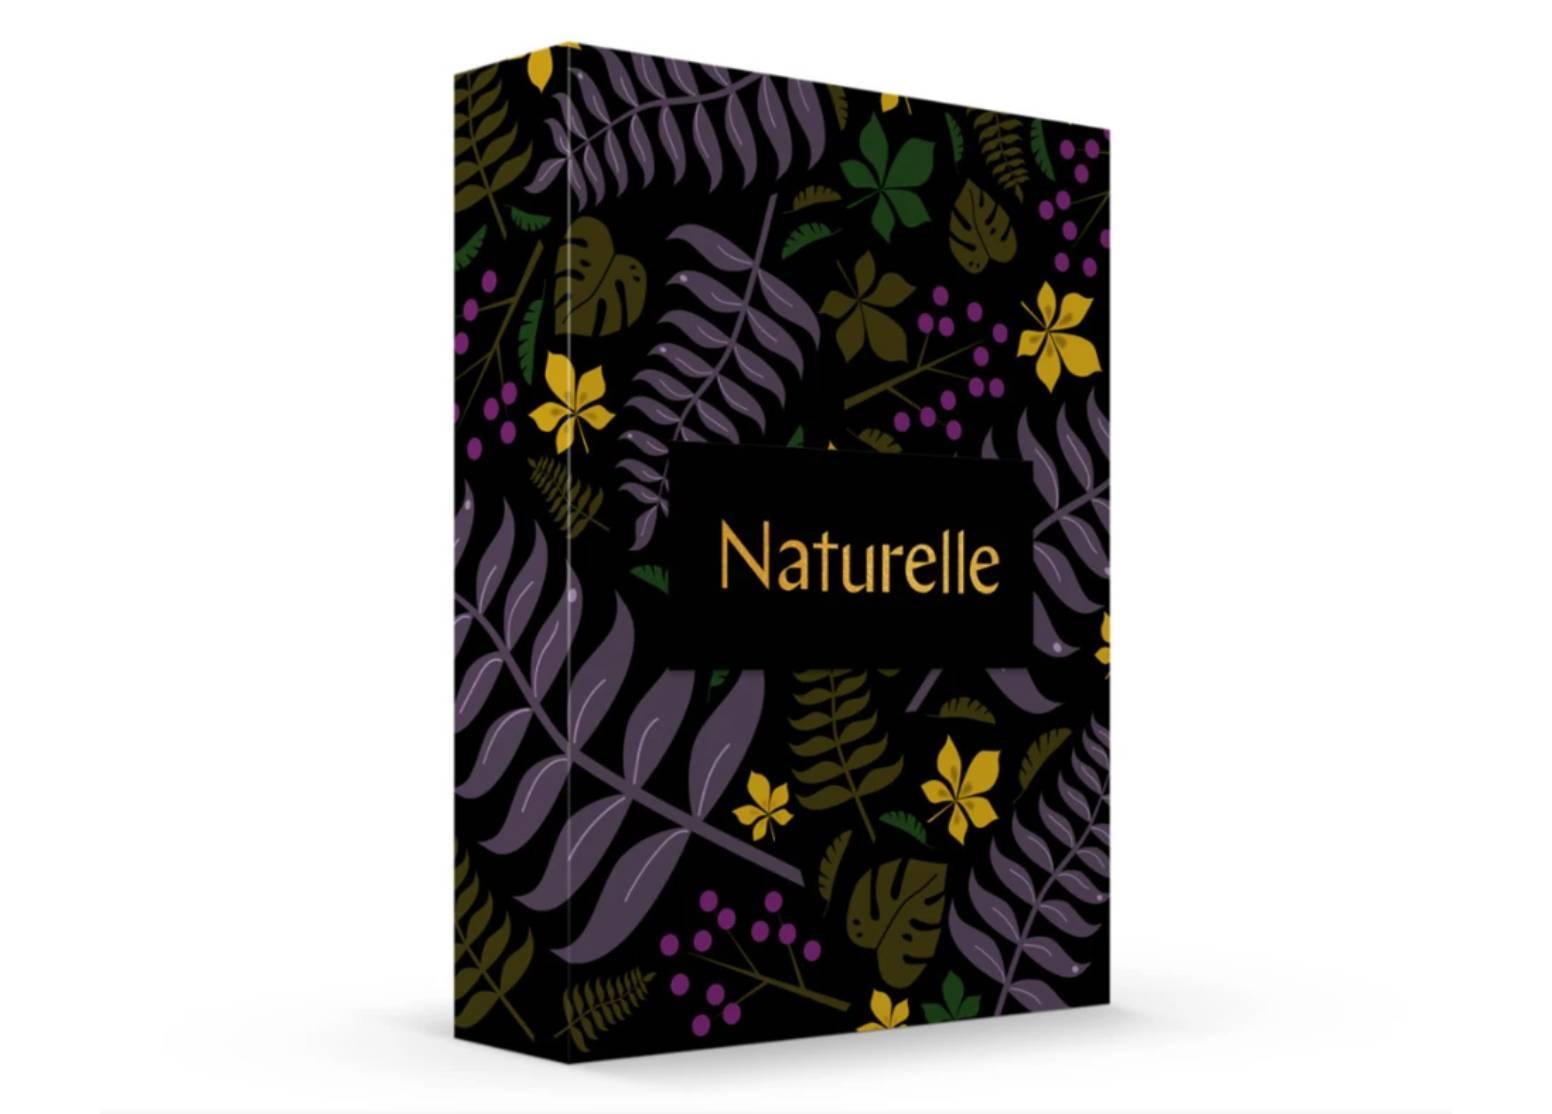 Calendario de Adviento Naturelle 2021